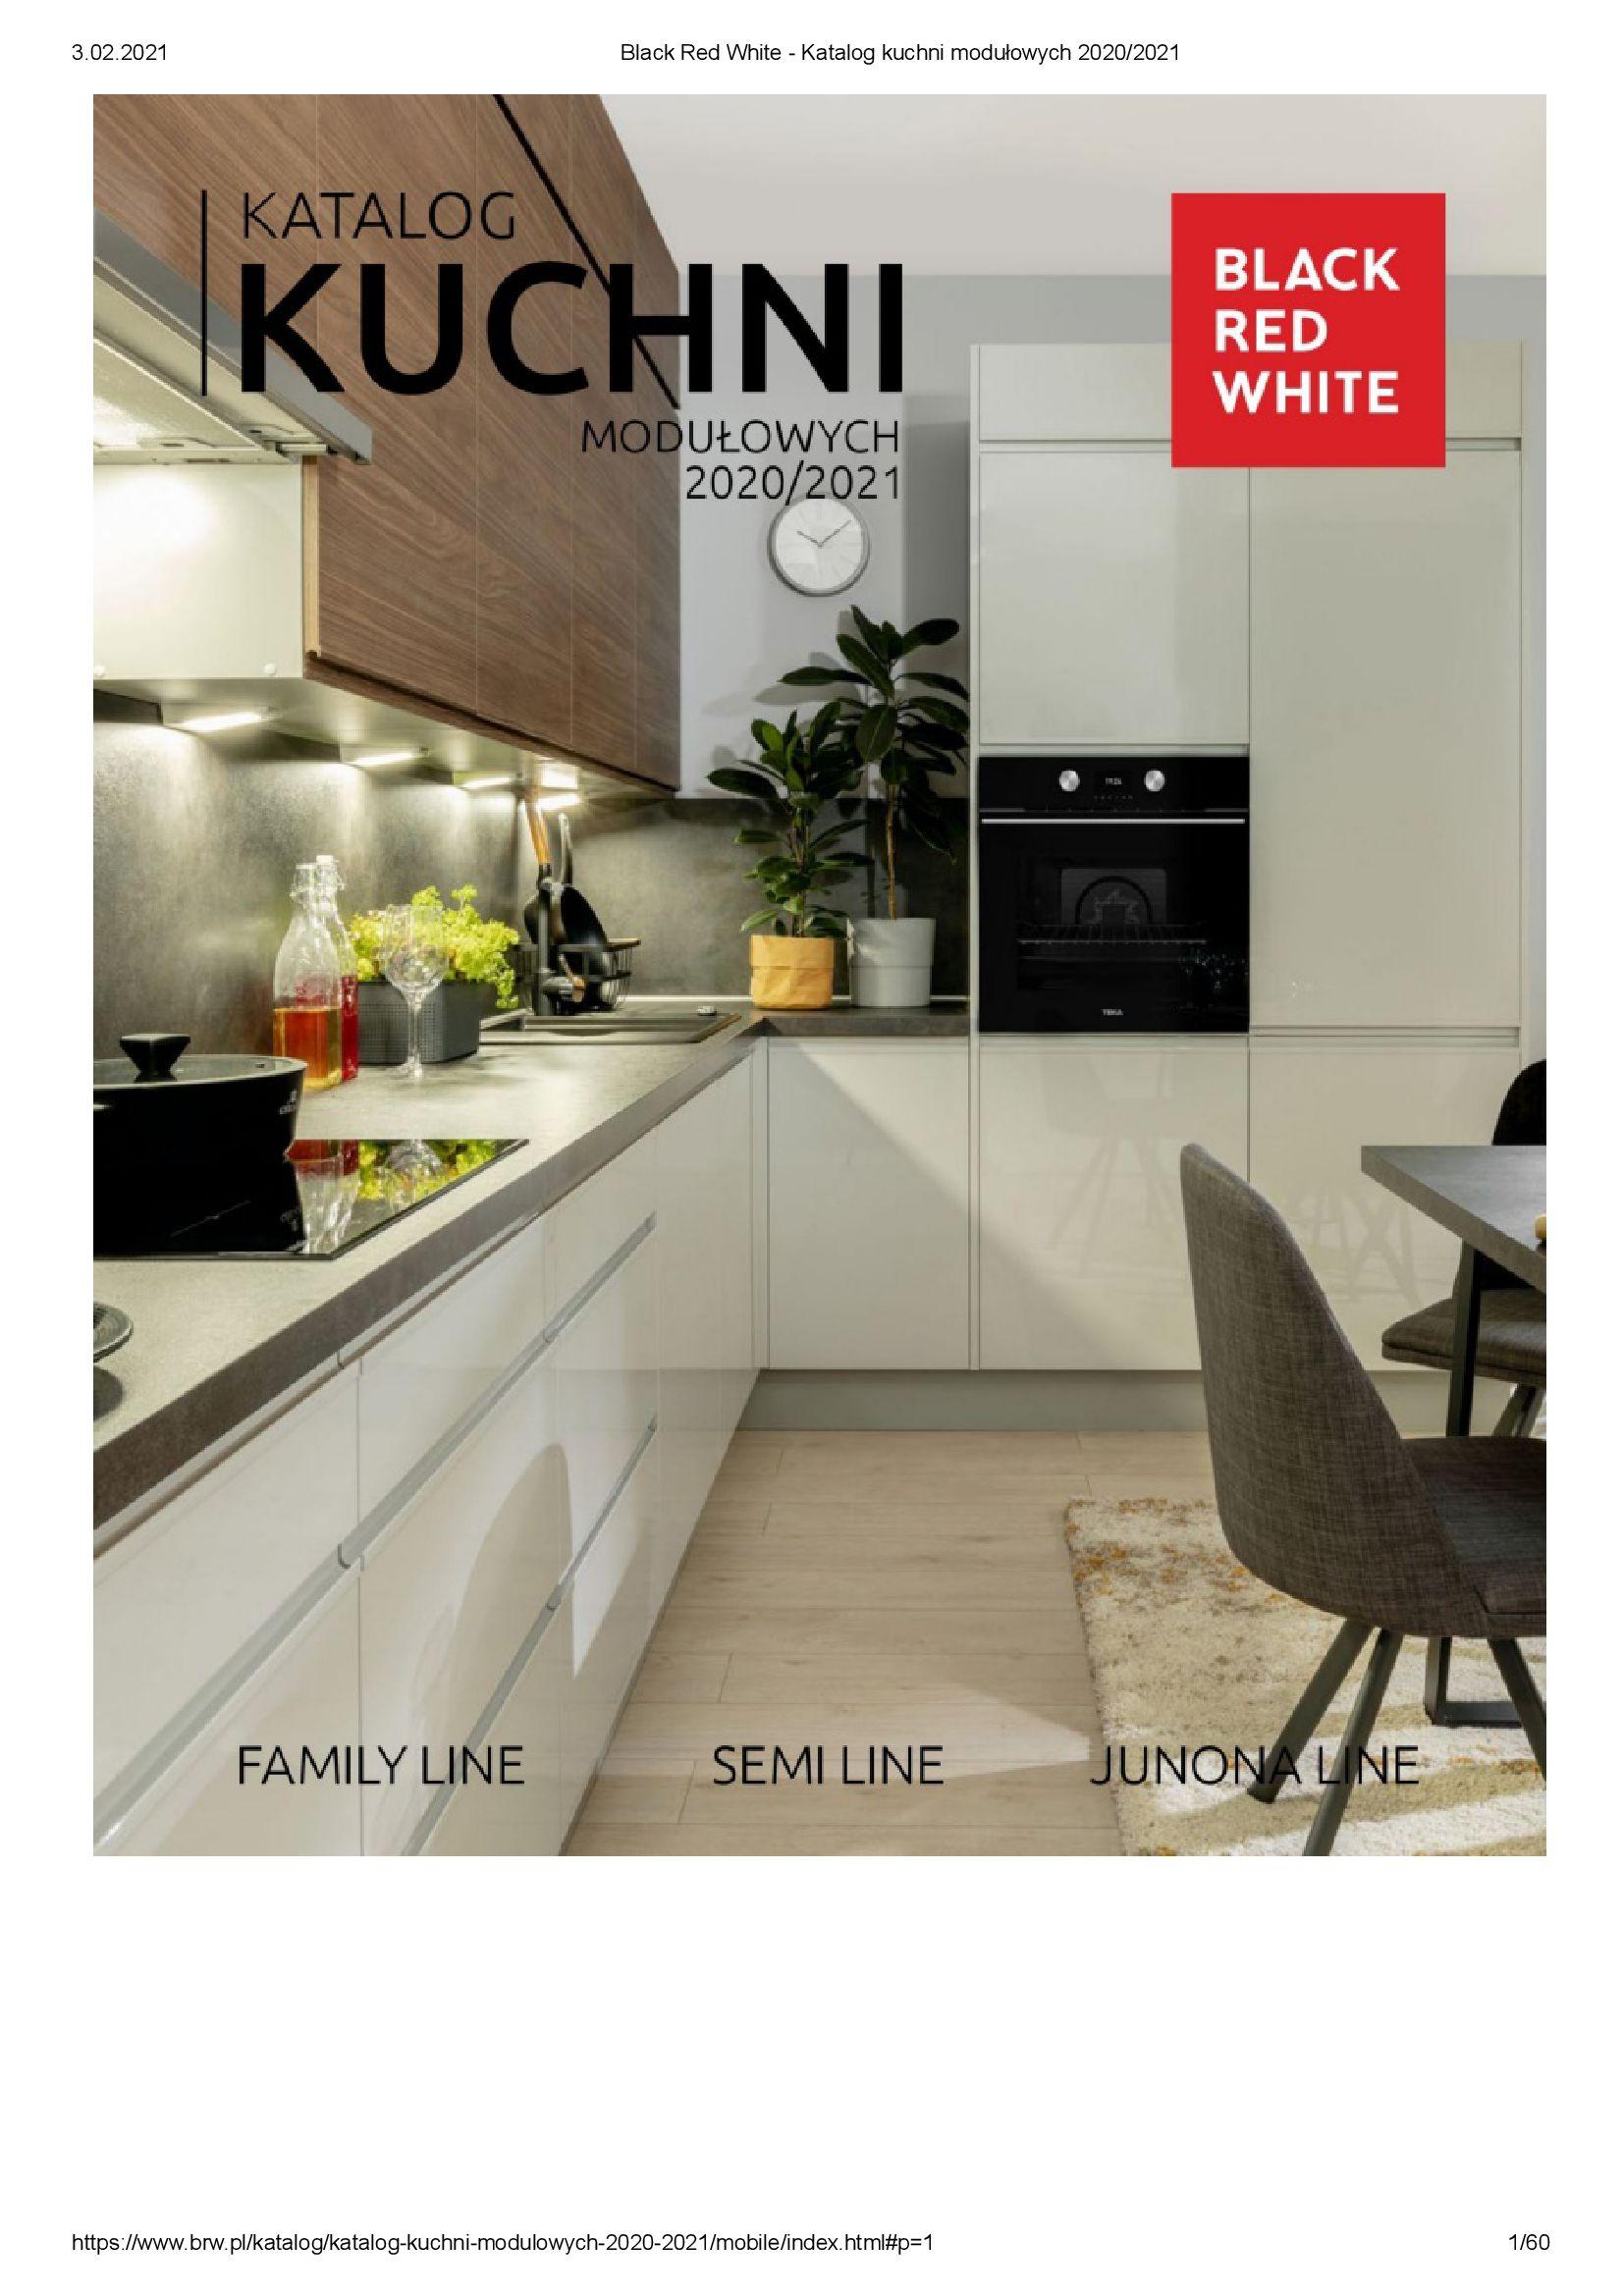 Black Red White:  Katalog - Kuchnie modułowe 2020/2021 31.12.2020